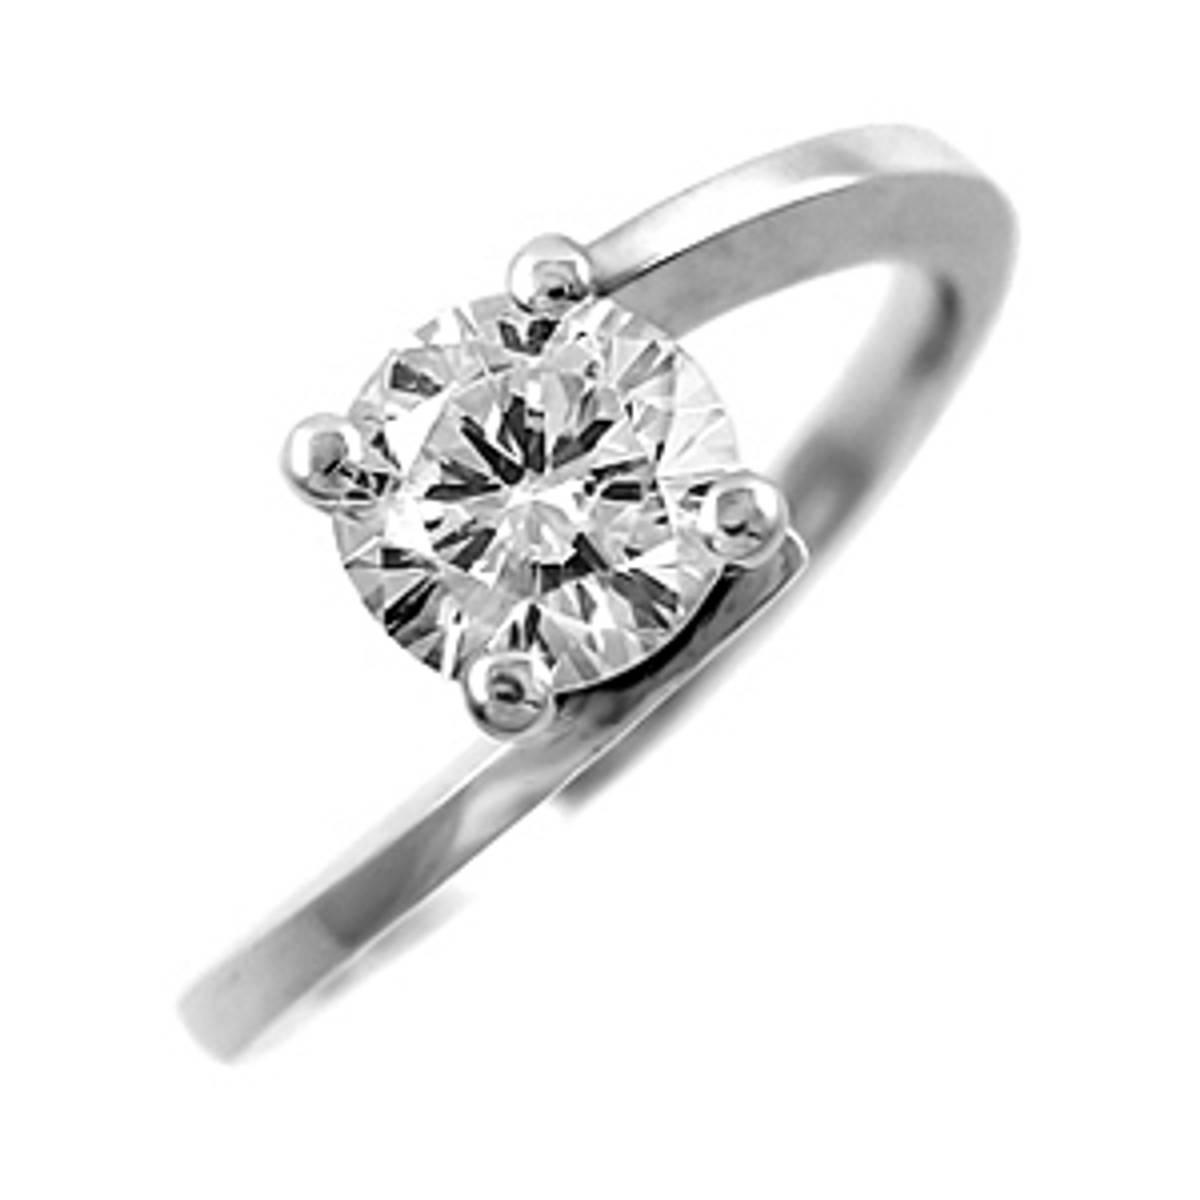 Irish made0.71ct brilliant cut diamondsolitaire ring setin 18ct white gold.